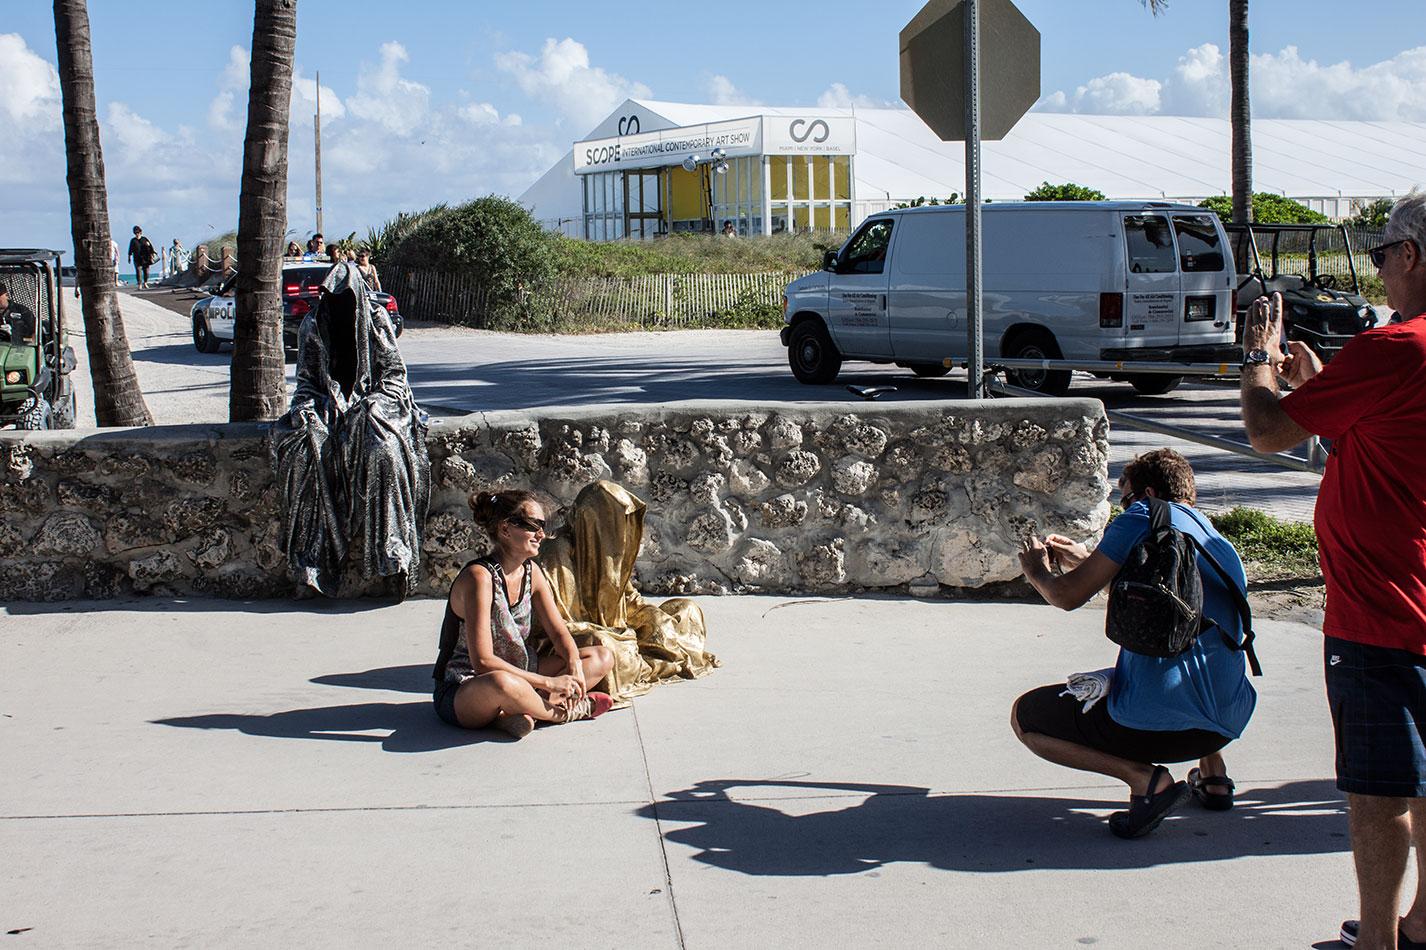 public-art-basel-miami-beach-fair-usa-florida-bass-museum-guardians-of-time-manfred-kili-kielnhofer-contemporary-fine-art-modern-arts-design-antiques-sculpture-6589